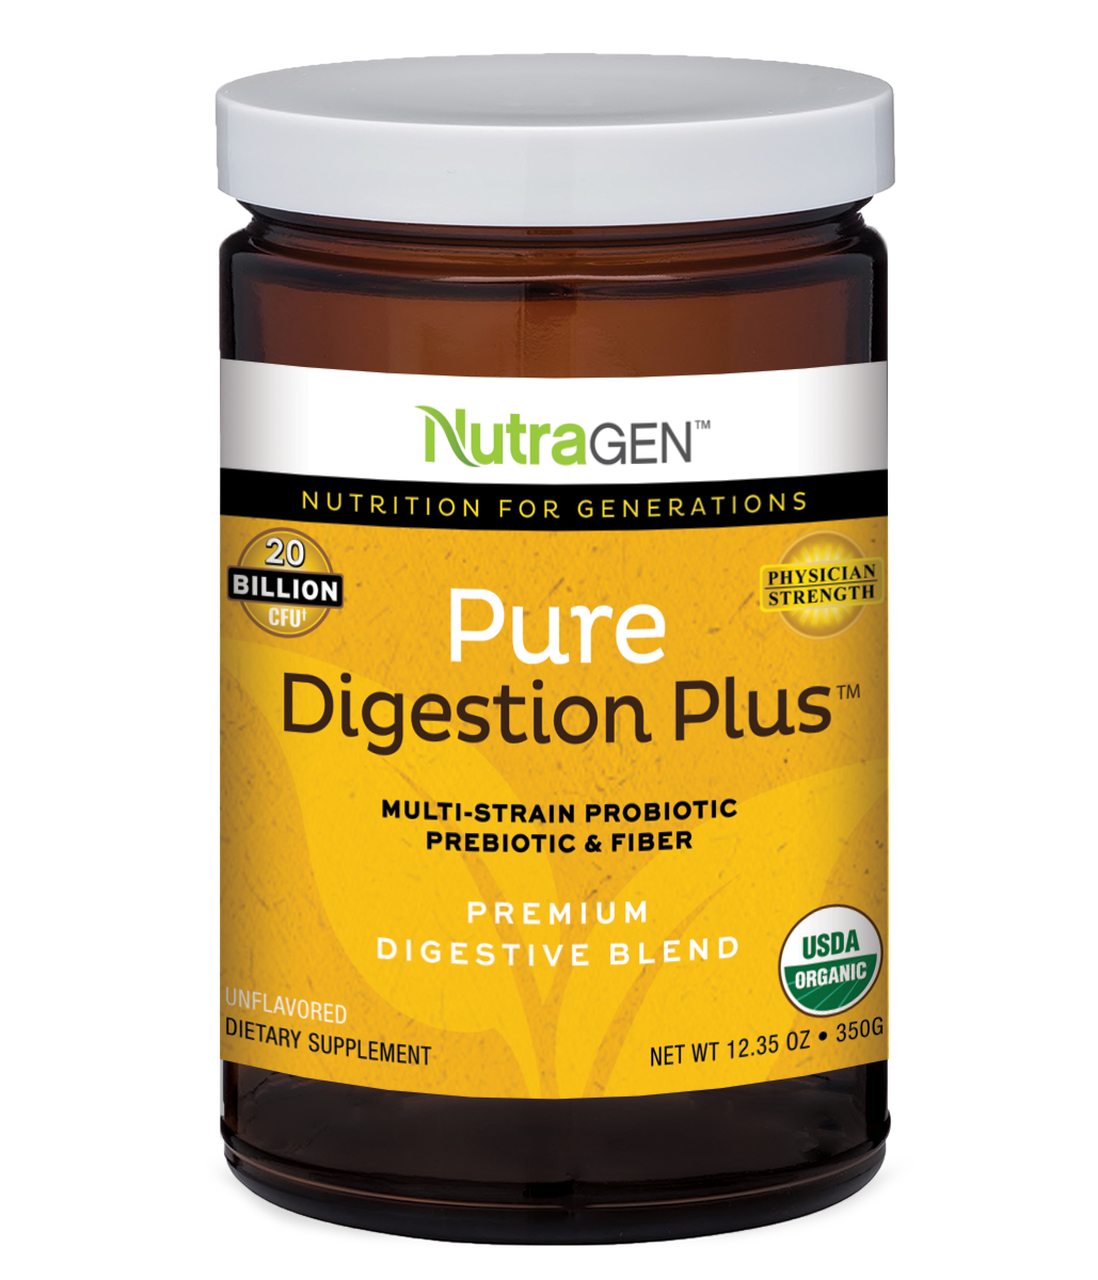 Nutragen Fiber Pure Digestion Plus, Nutragen Fiber, Digestion Plus, Gut Healing, IBS Fiber